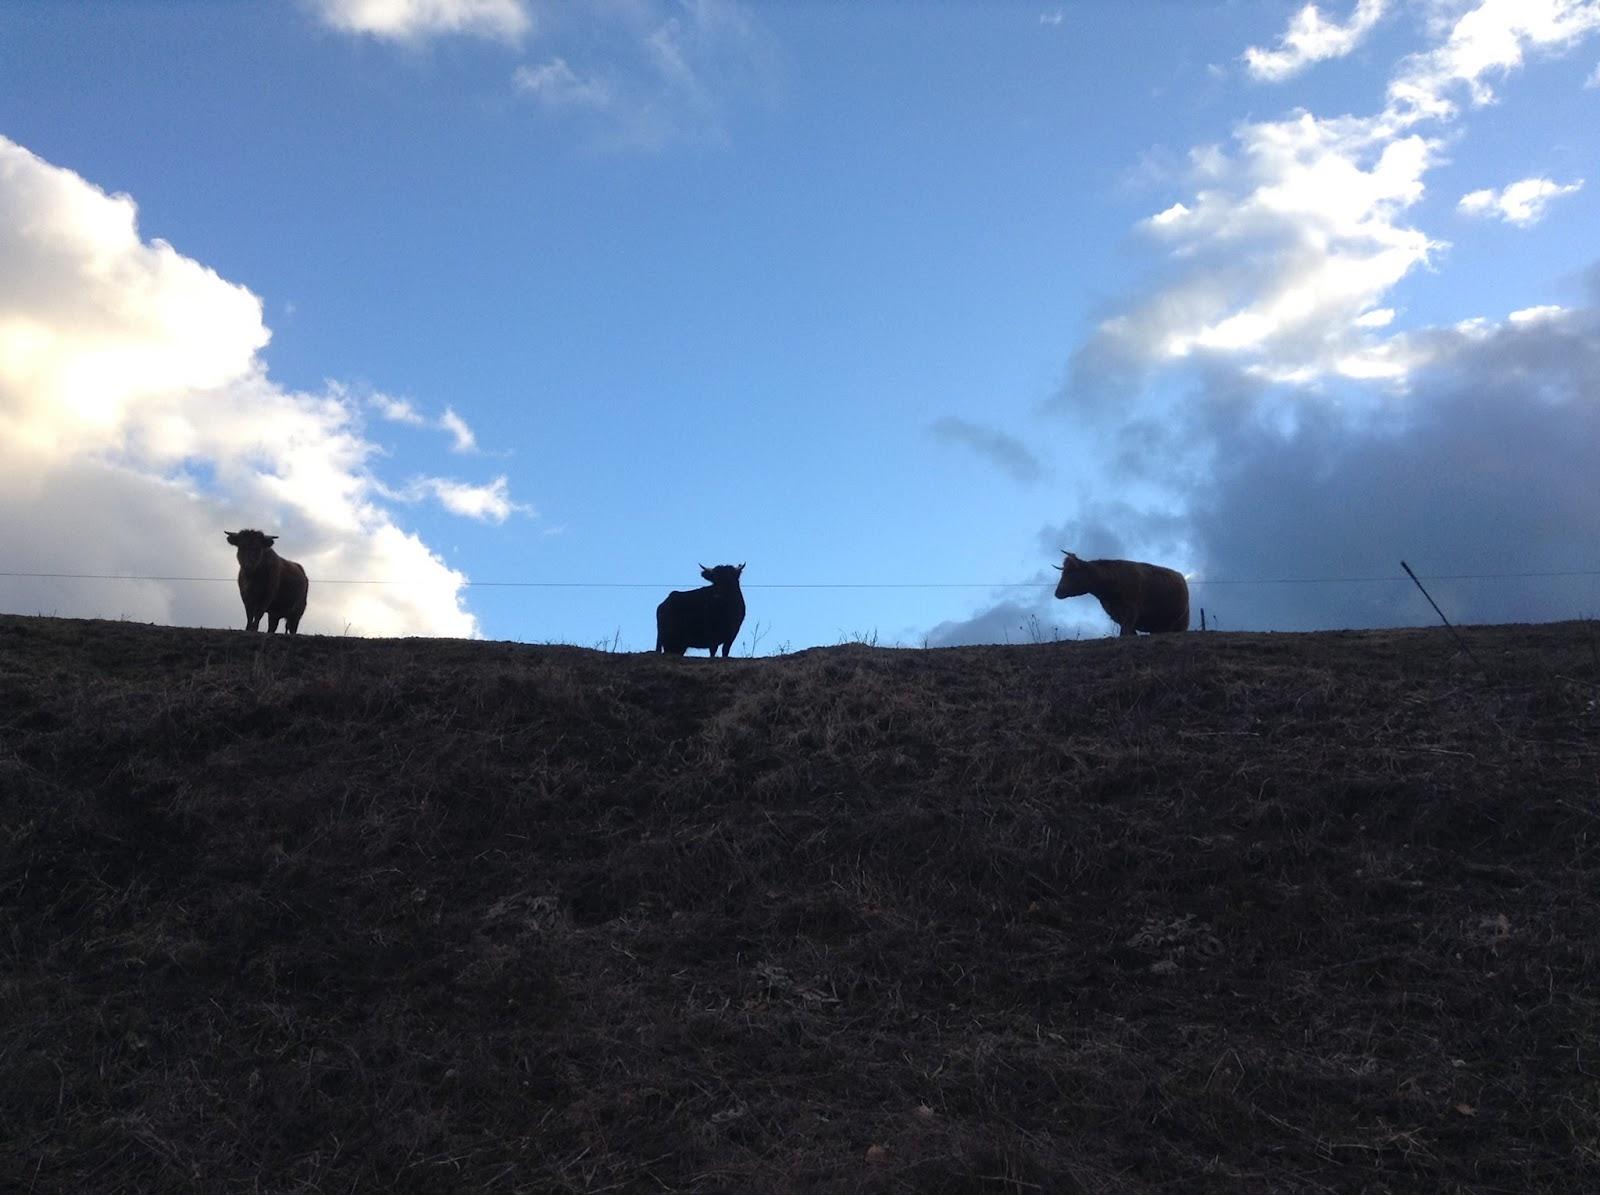 Farm Image 2